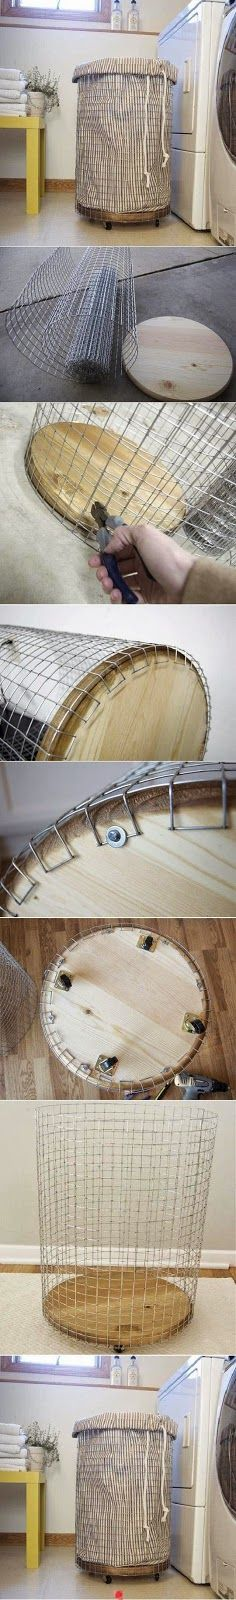 DIY corbeille de linge !